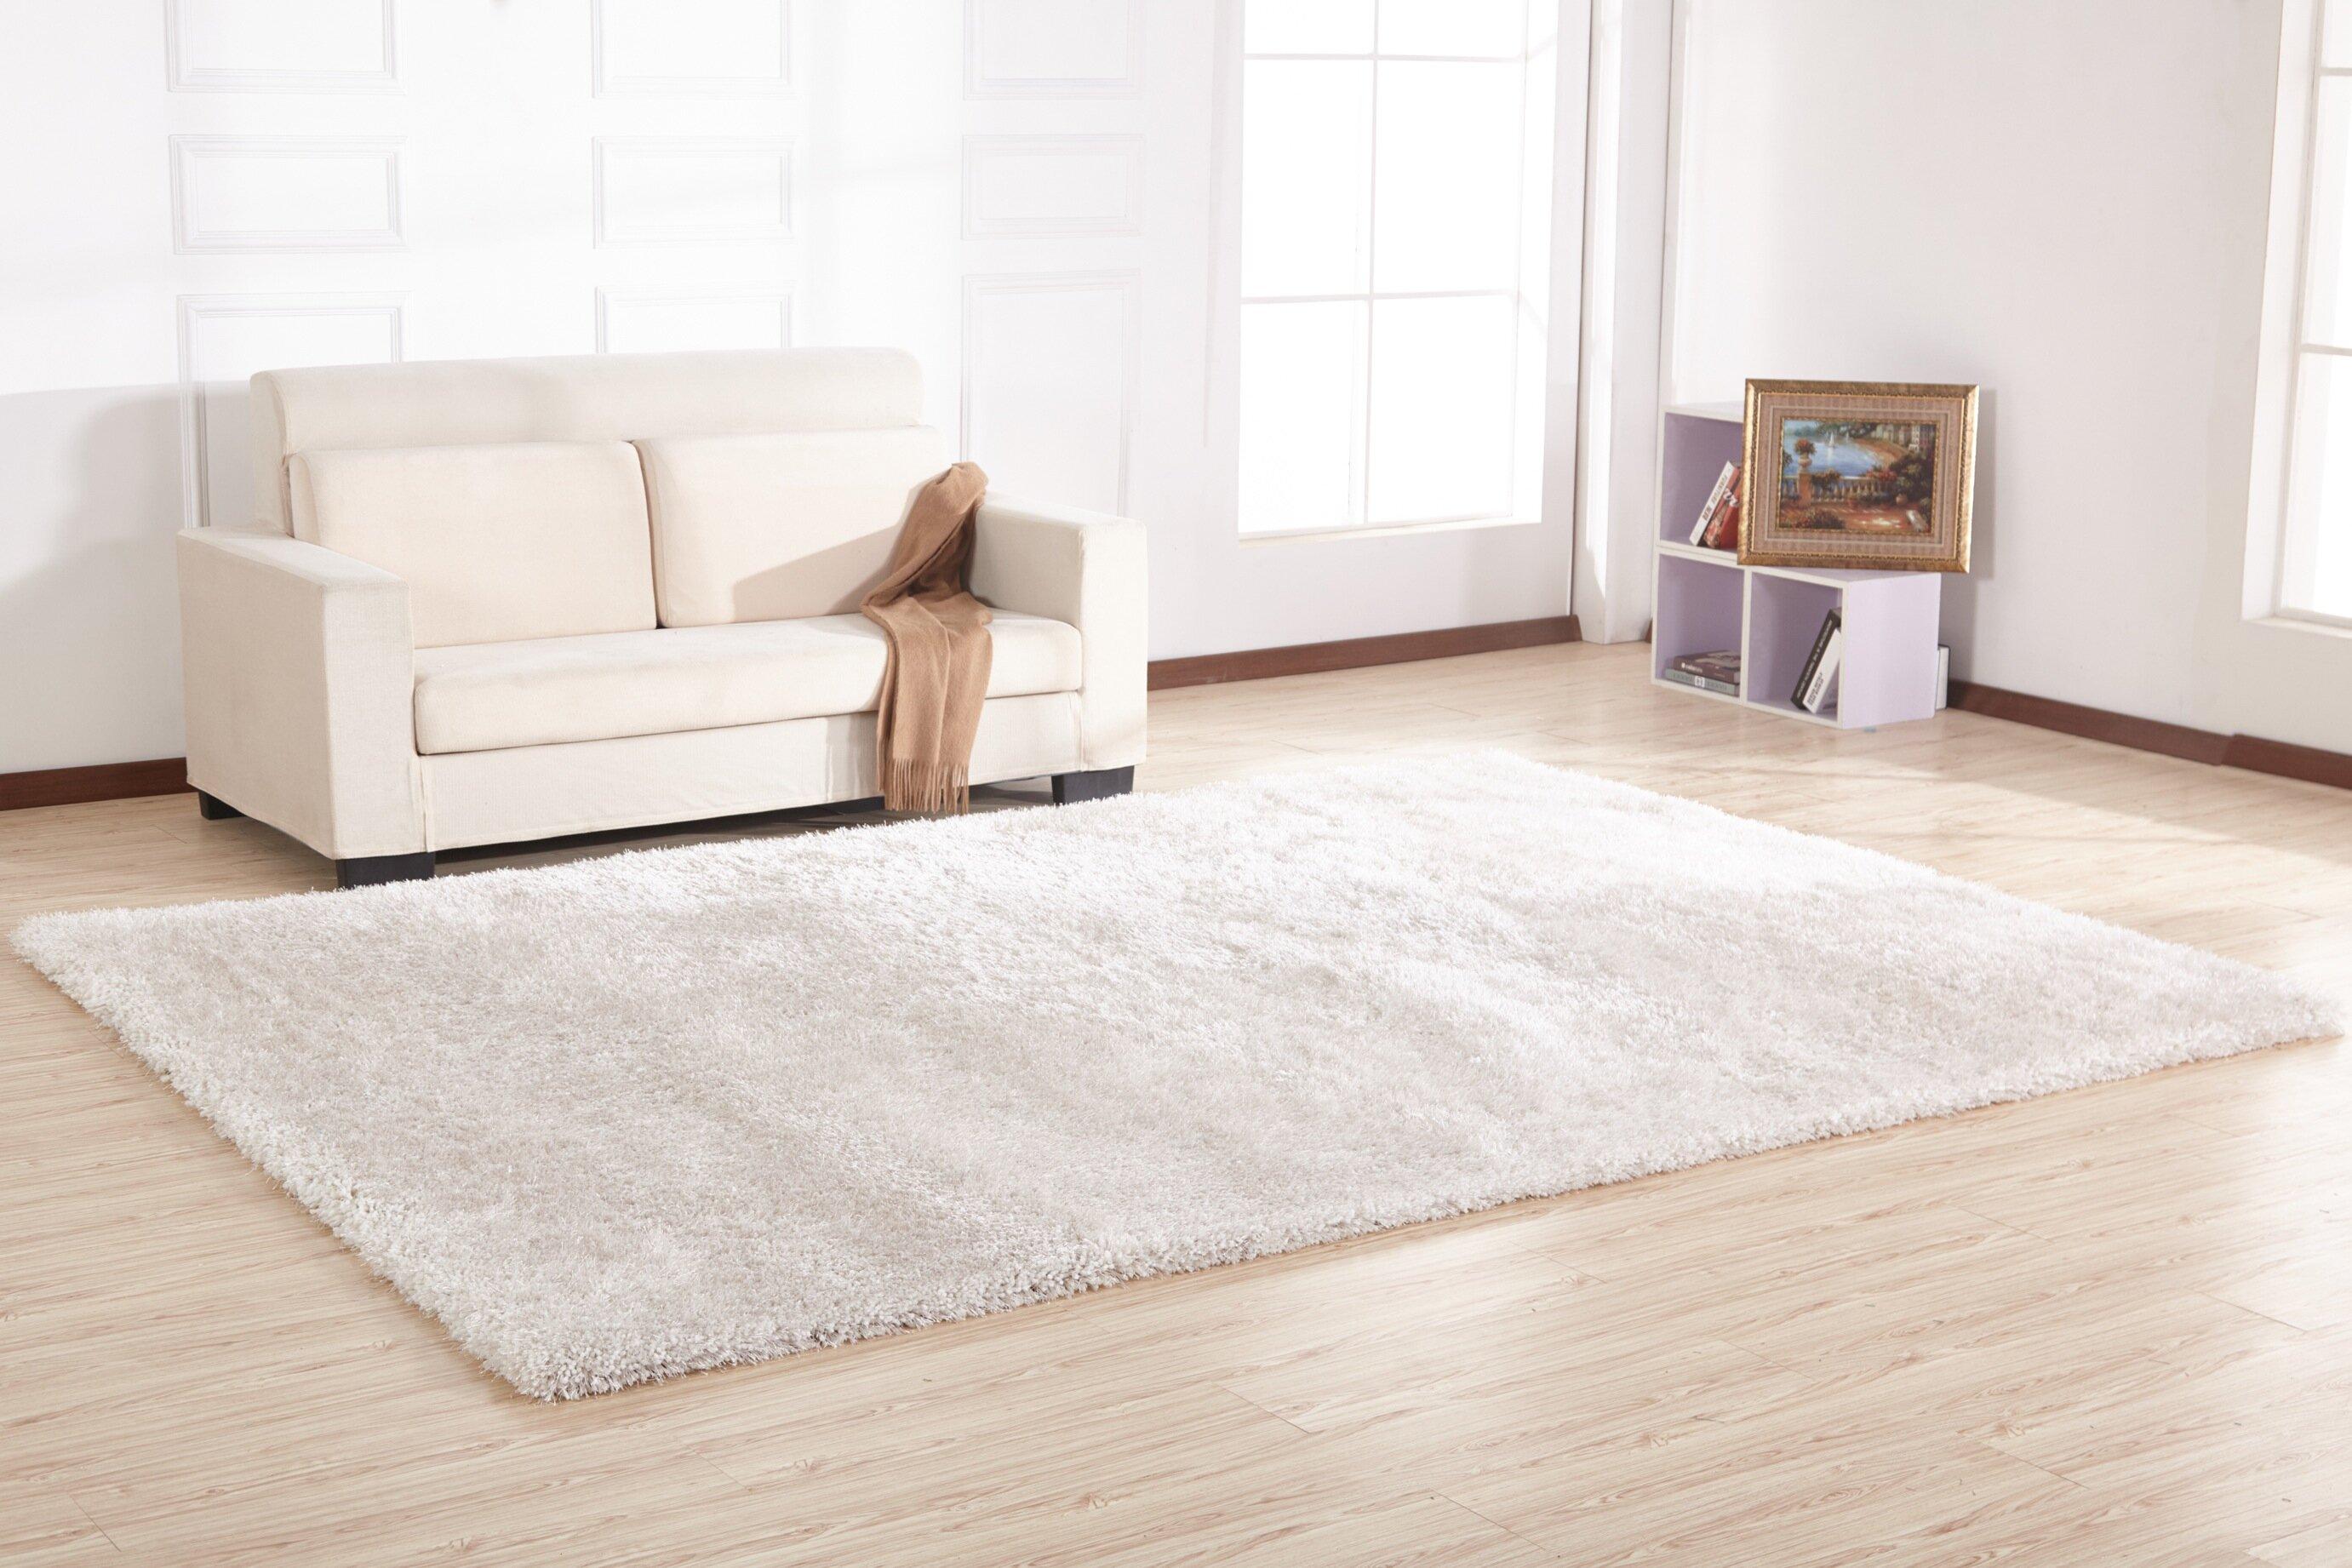 Off white area rug Wool People Rug Factory Plus Handtufted Off White Area Rug Wayfair